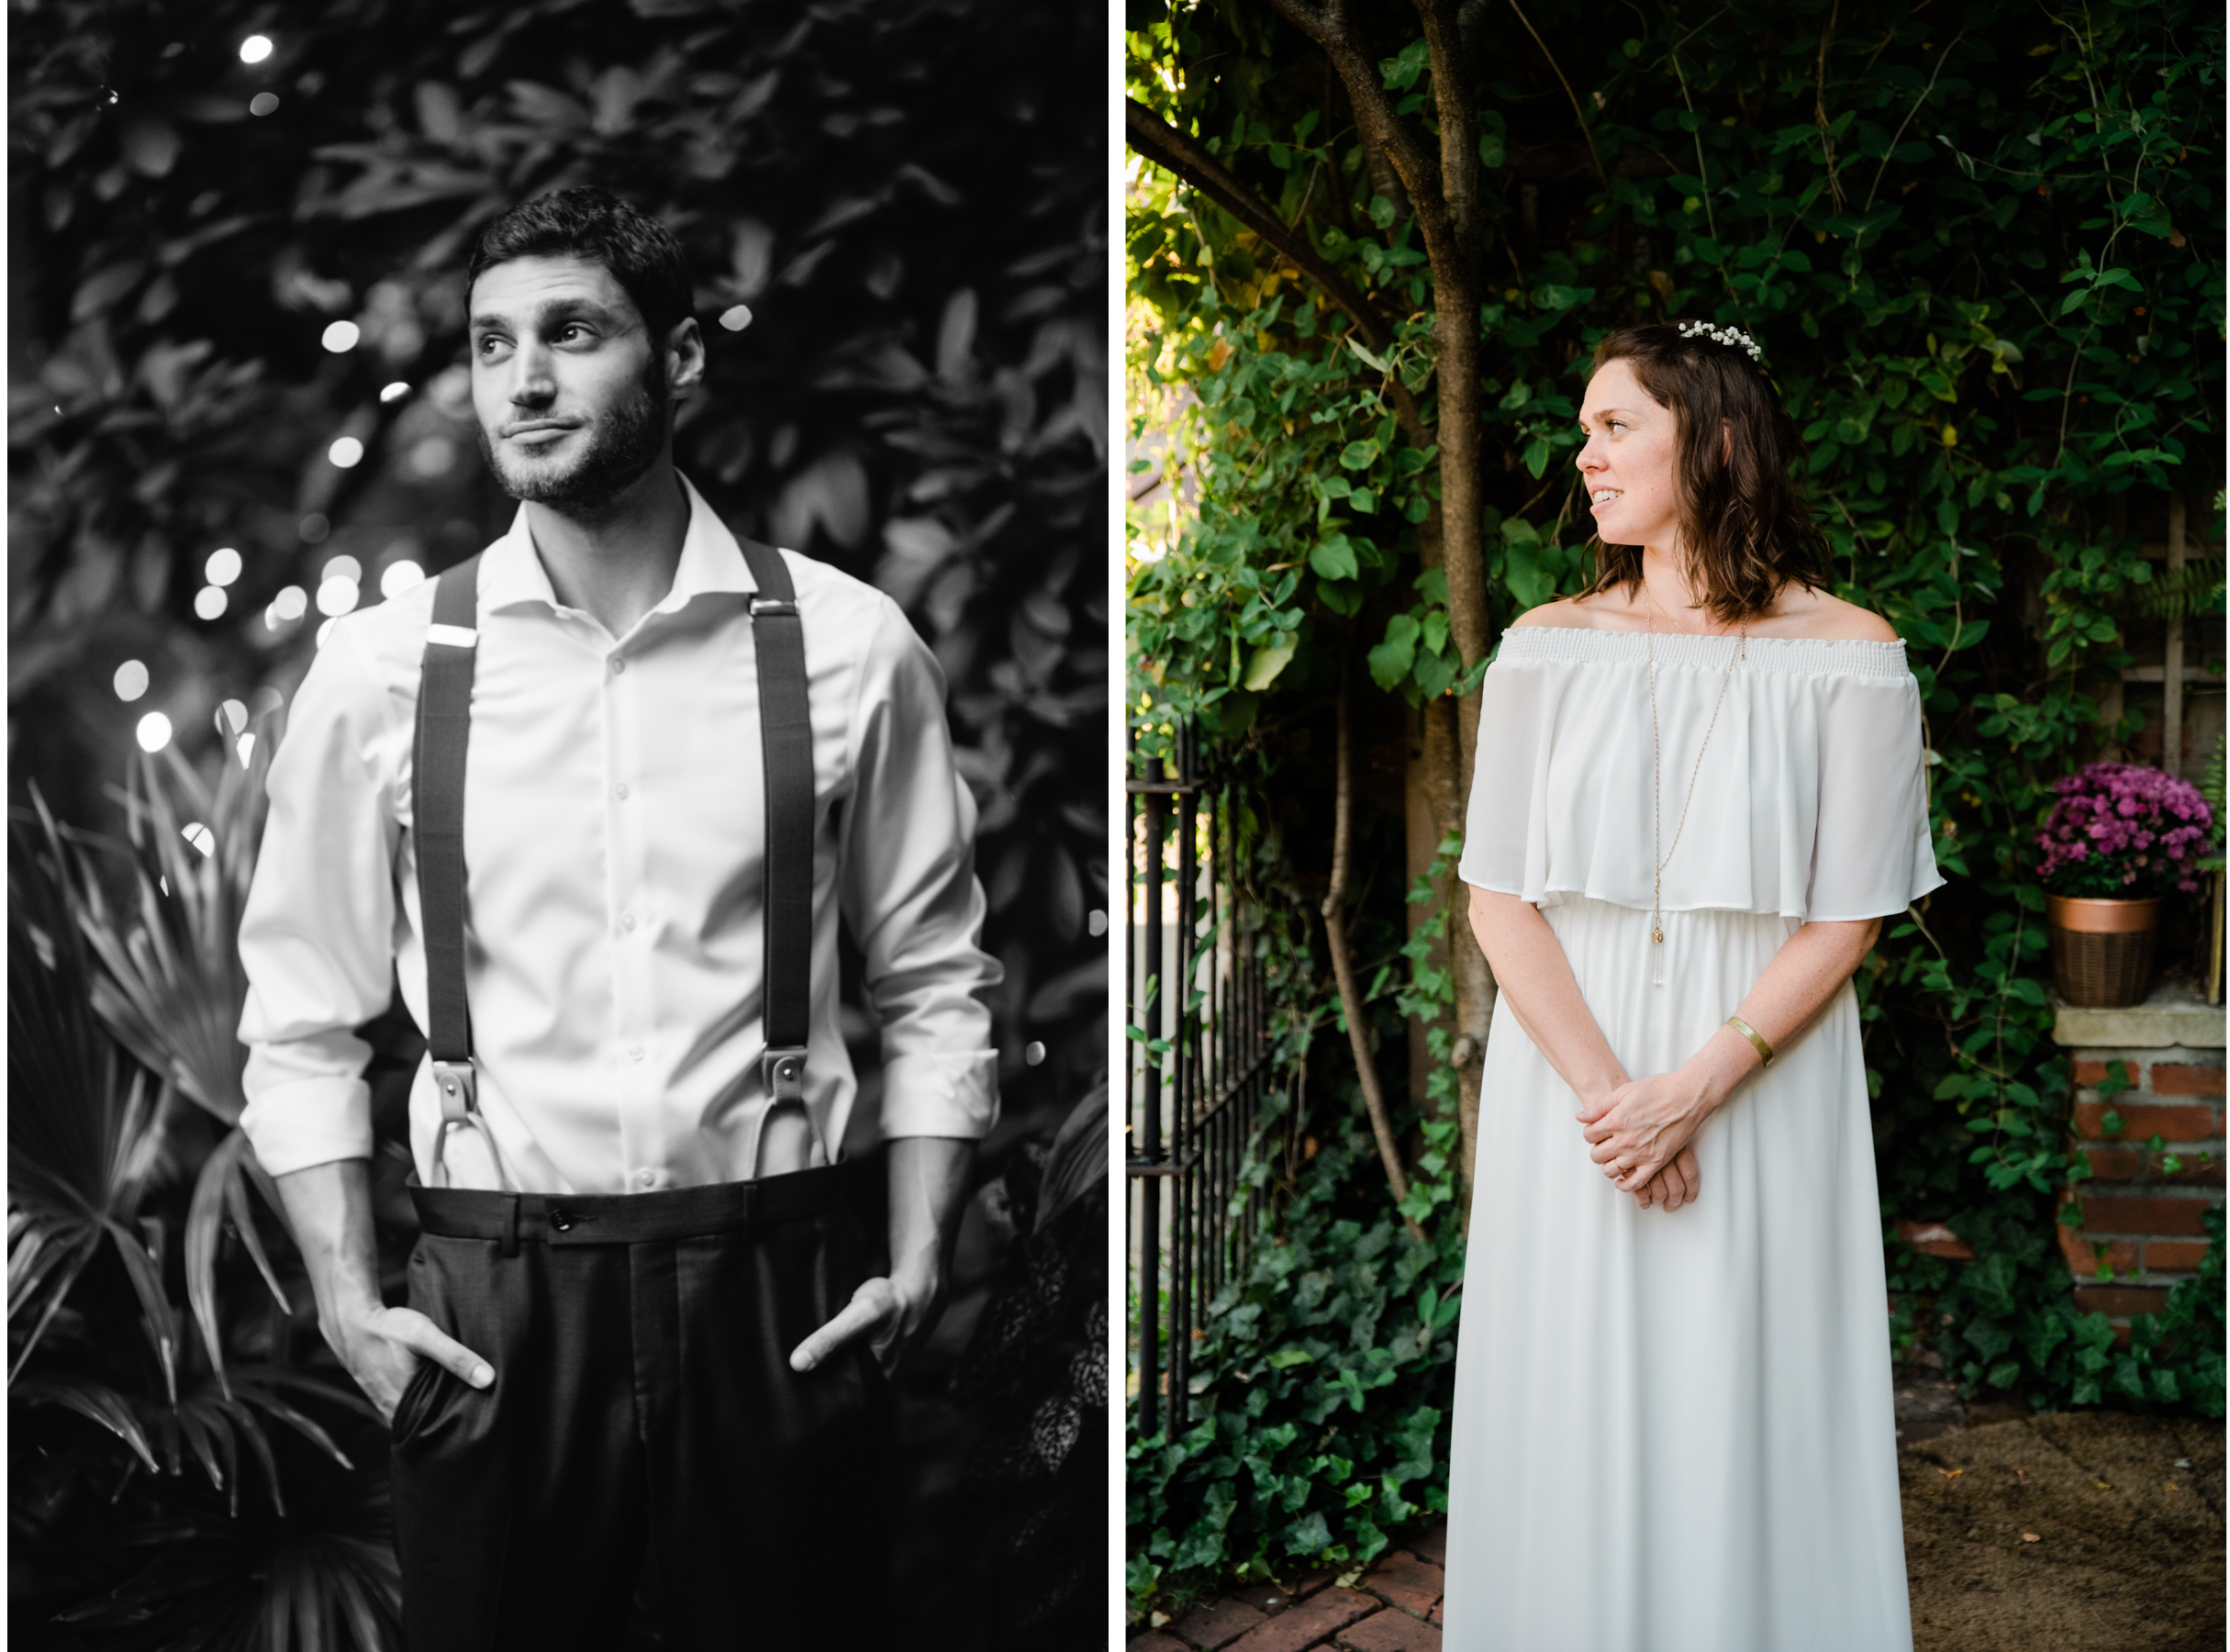 bride and groom portraits, Pittsburgh wedding photographer.jpg